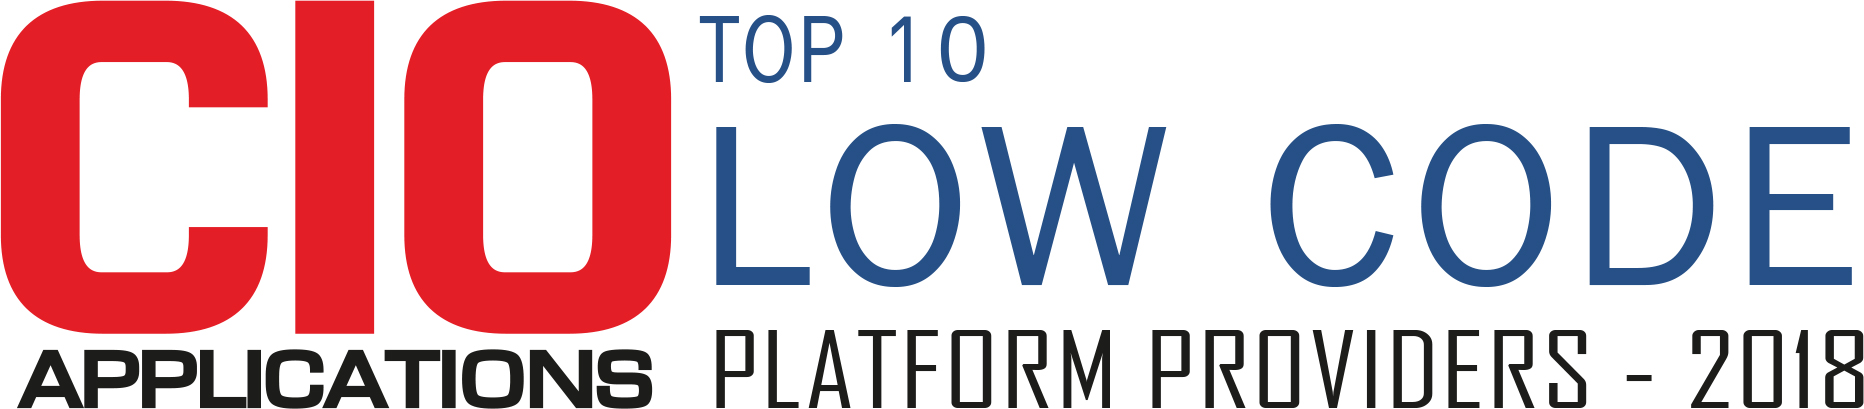 Top 10 Companies Providing Low Code Platform - 2018